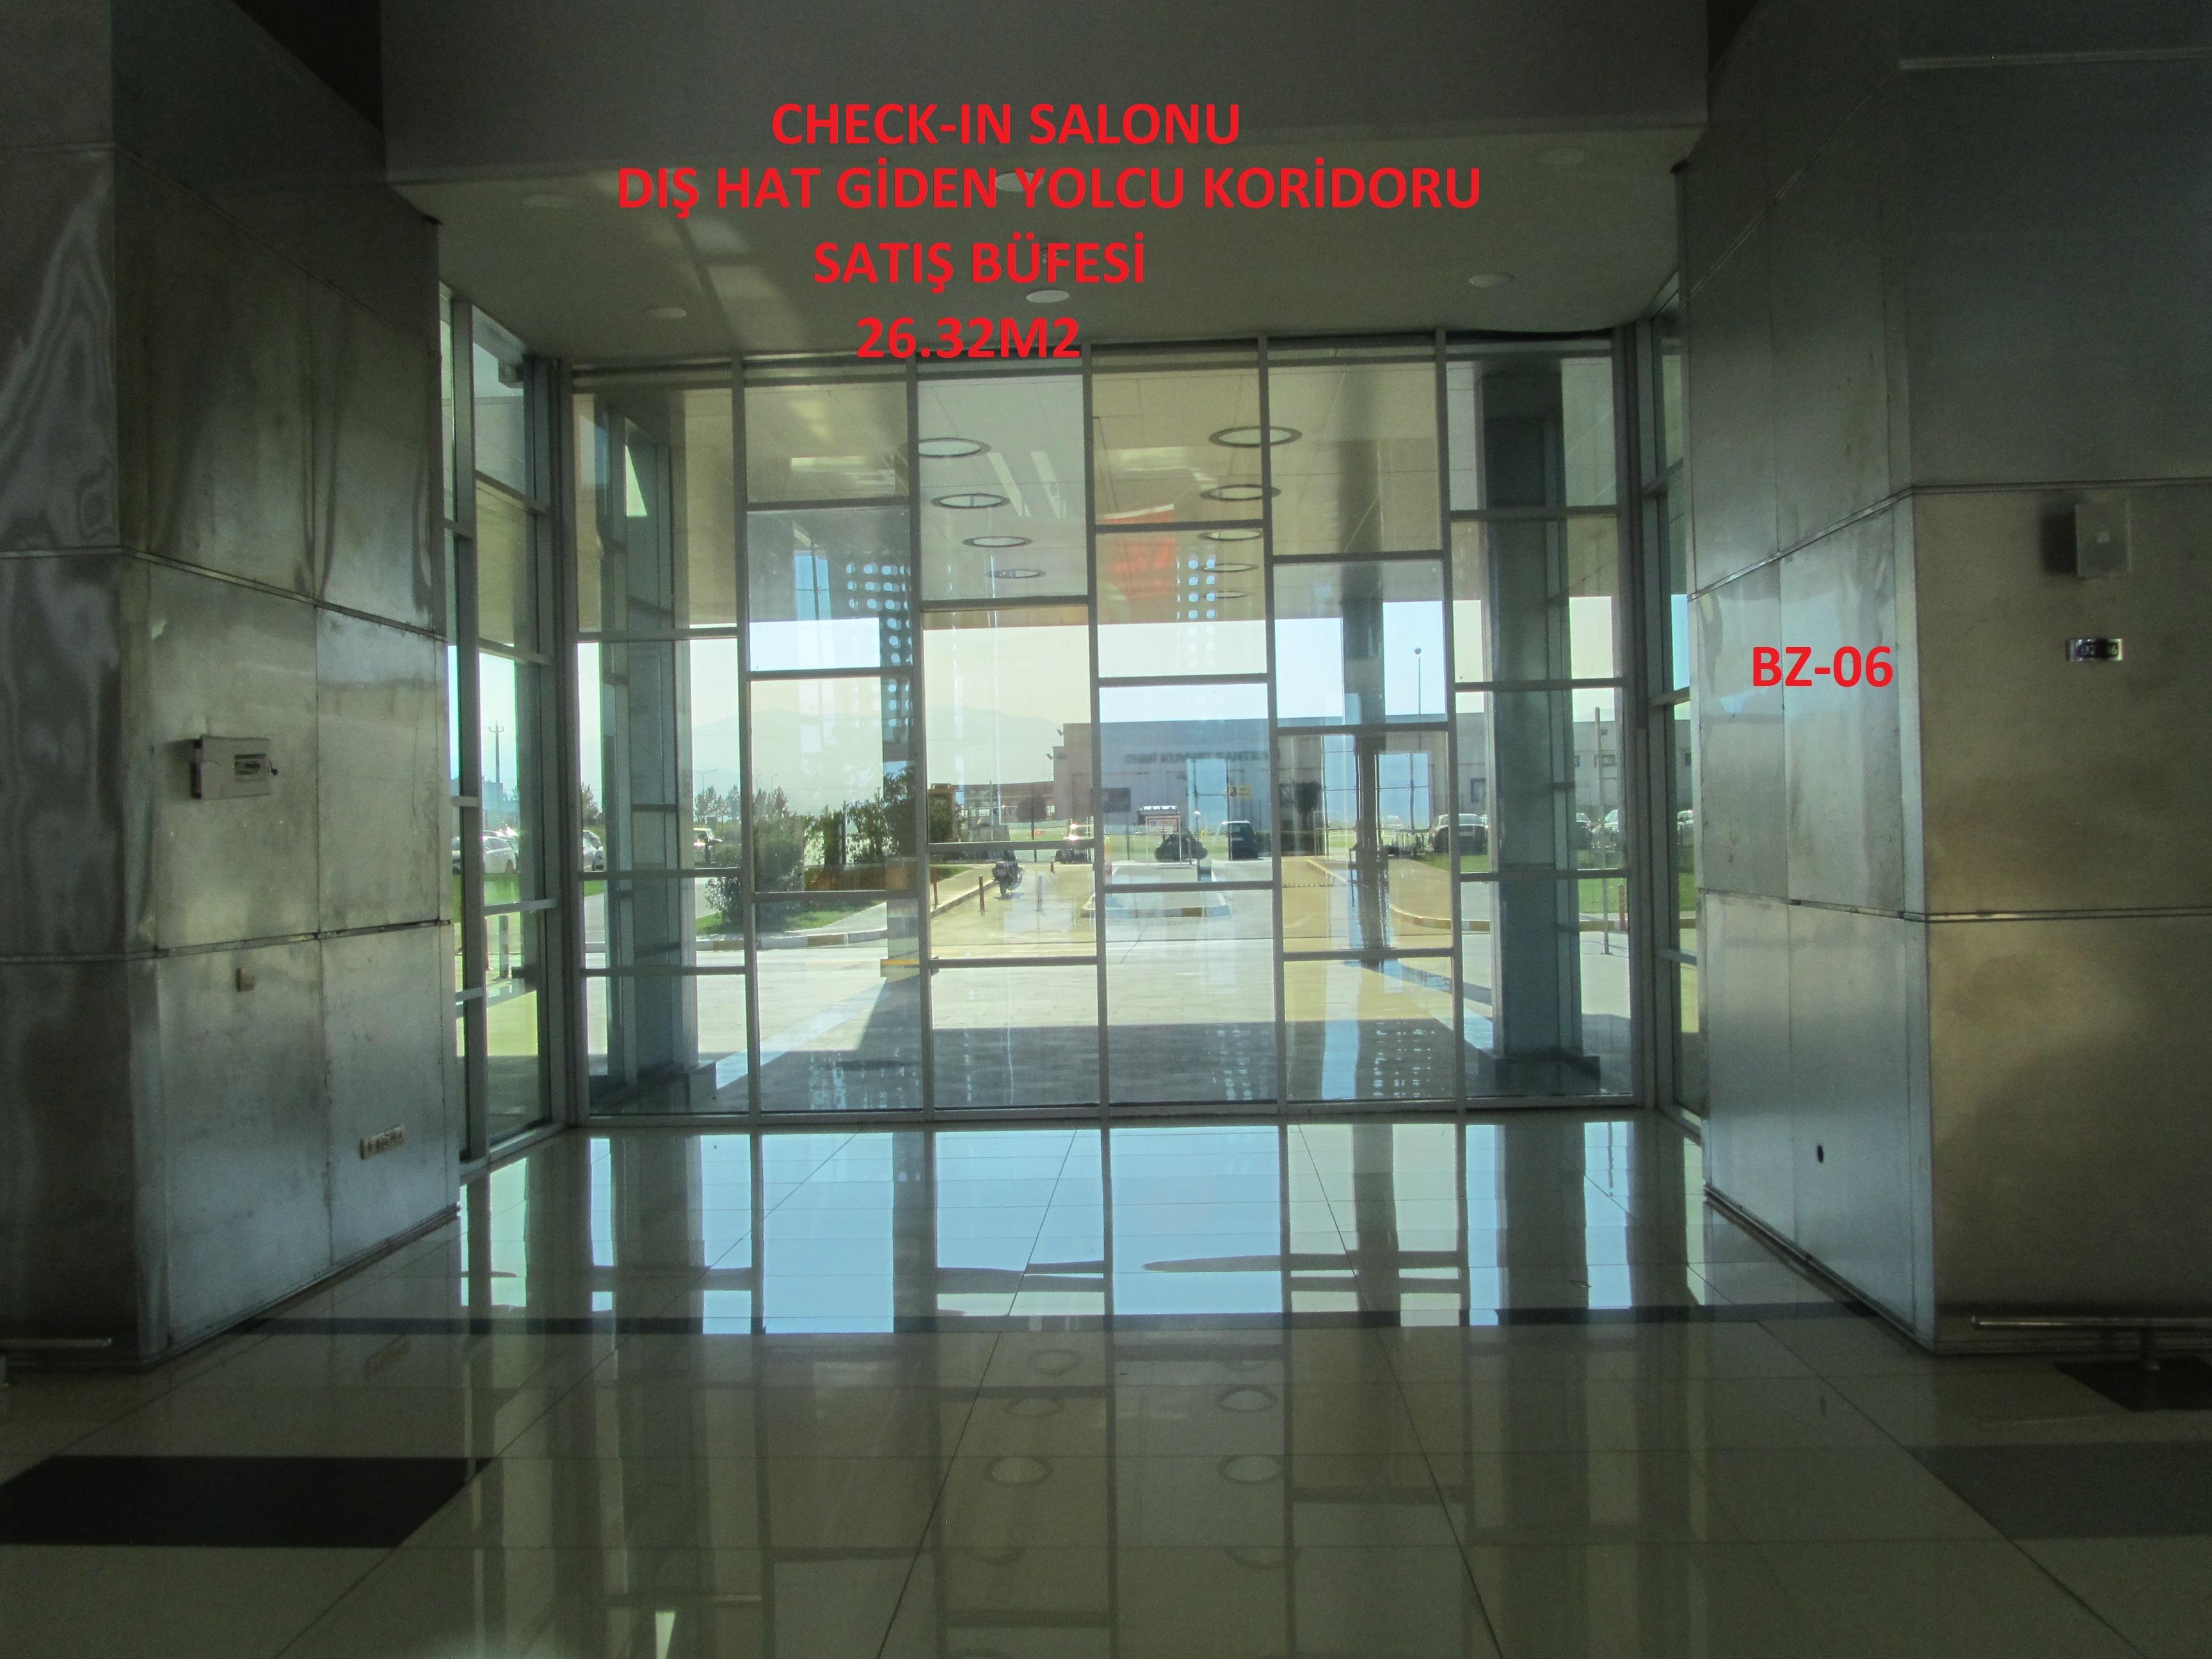 BZ-06.jpg